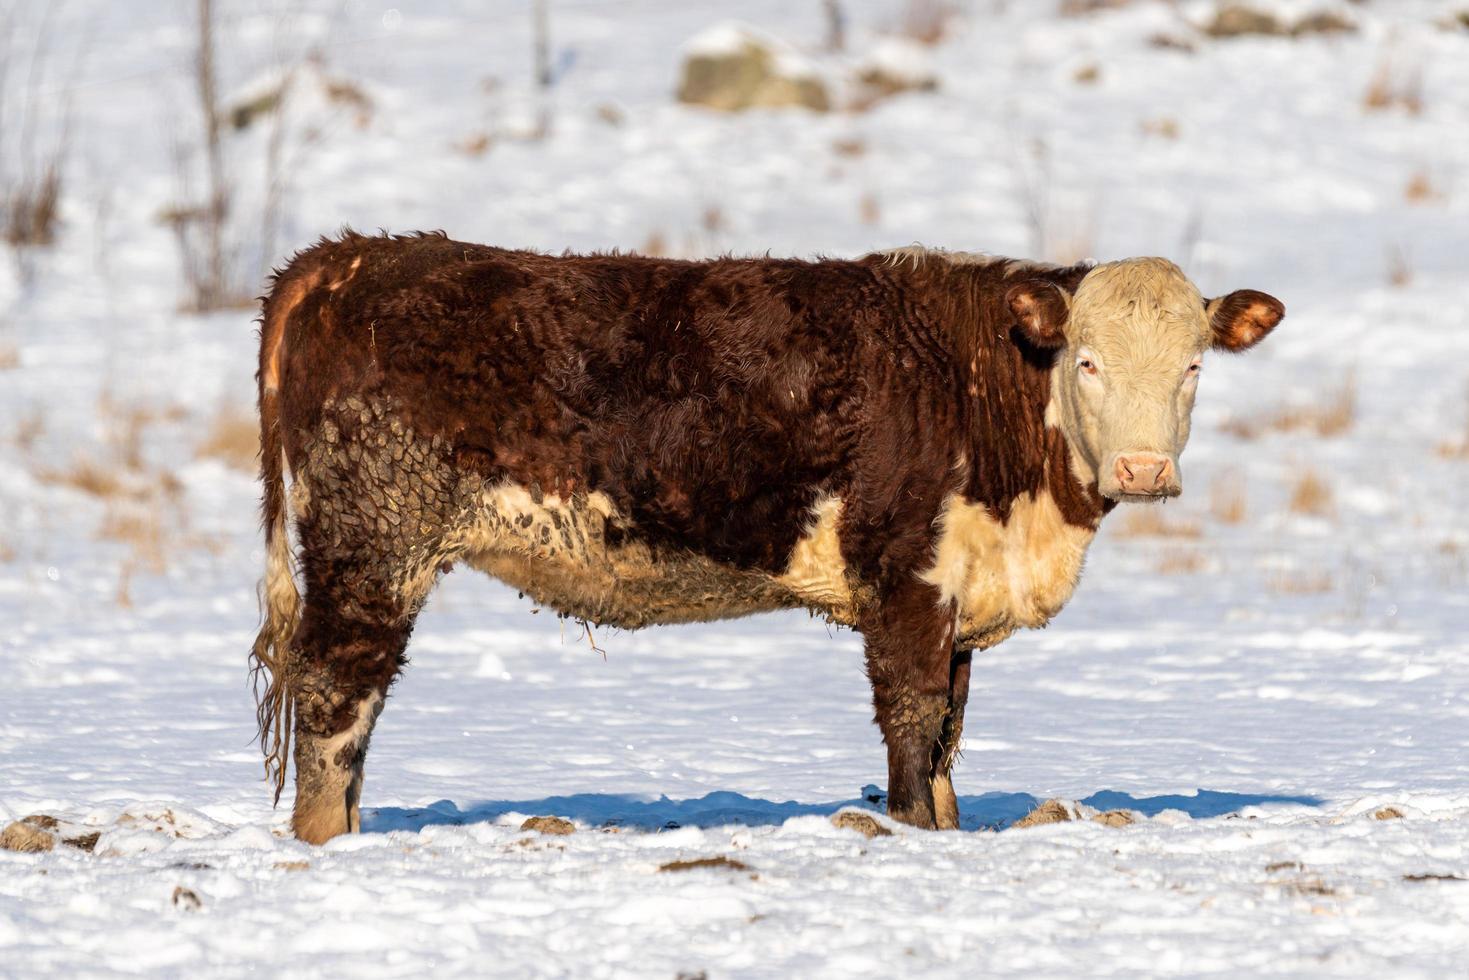 smutsig brun ko utomhus i en betesmark en solig vinterdag foto